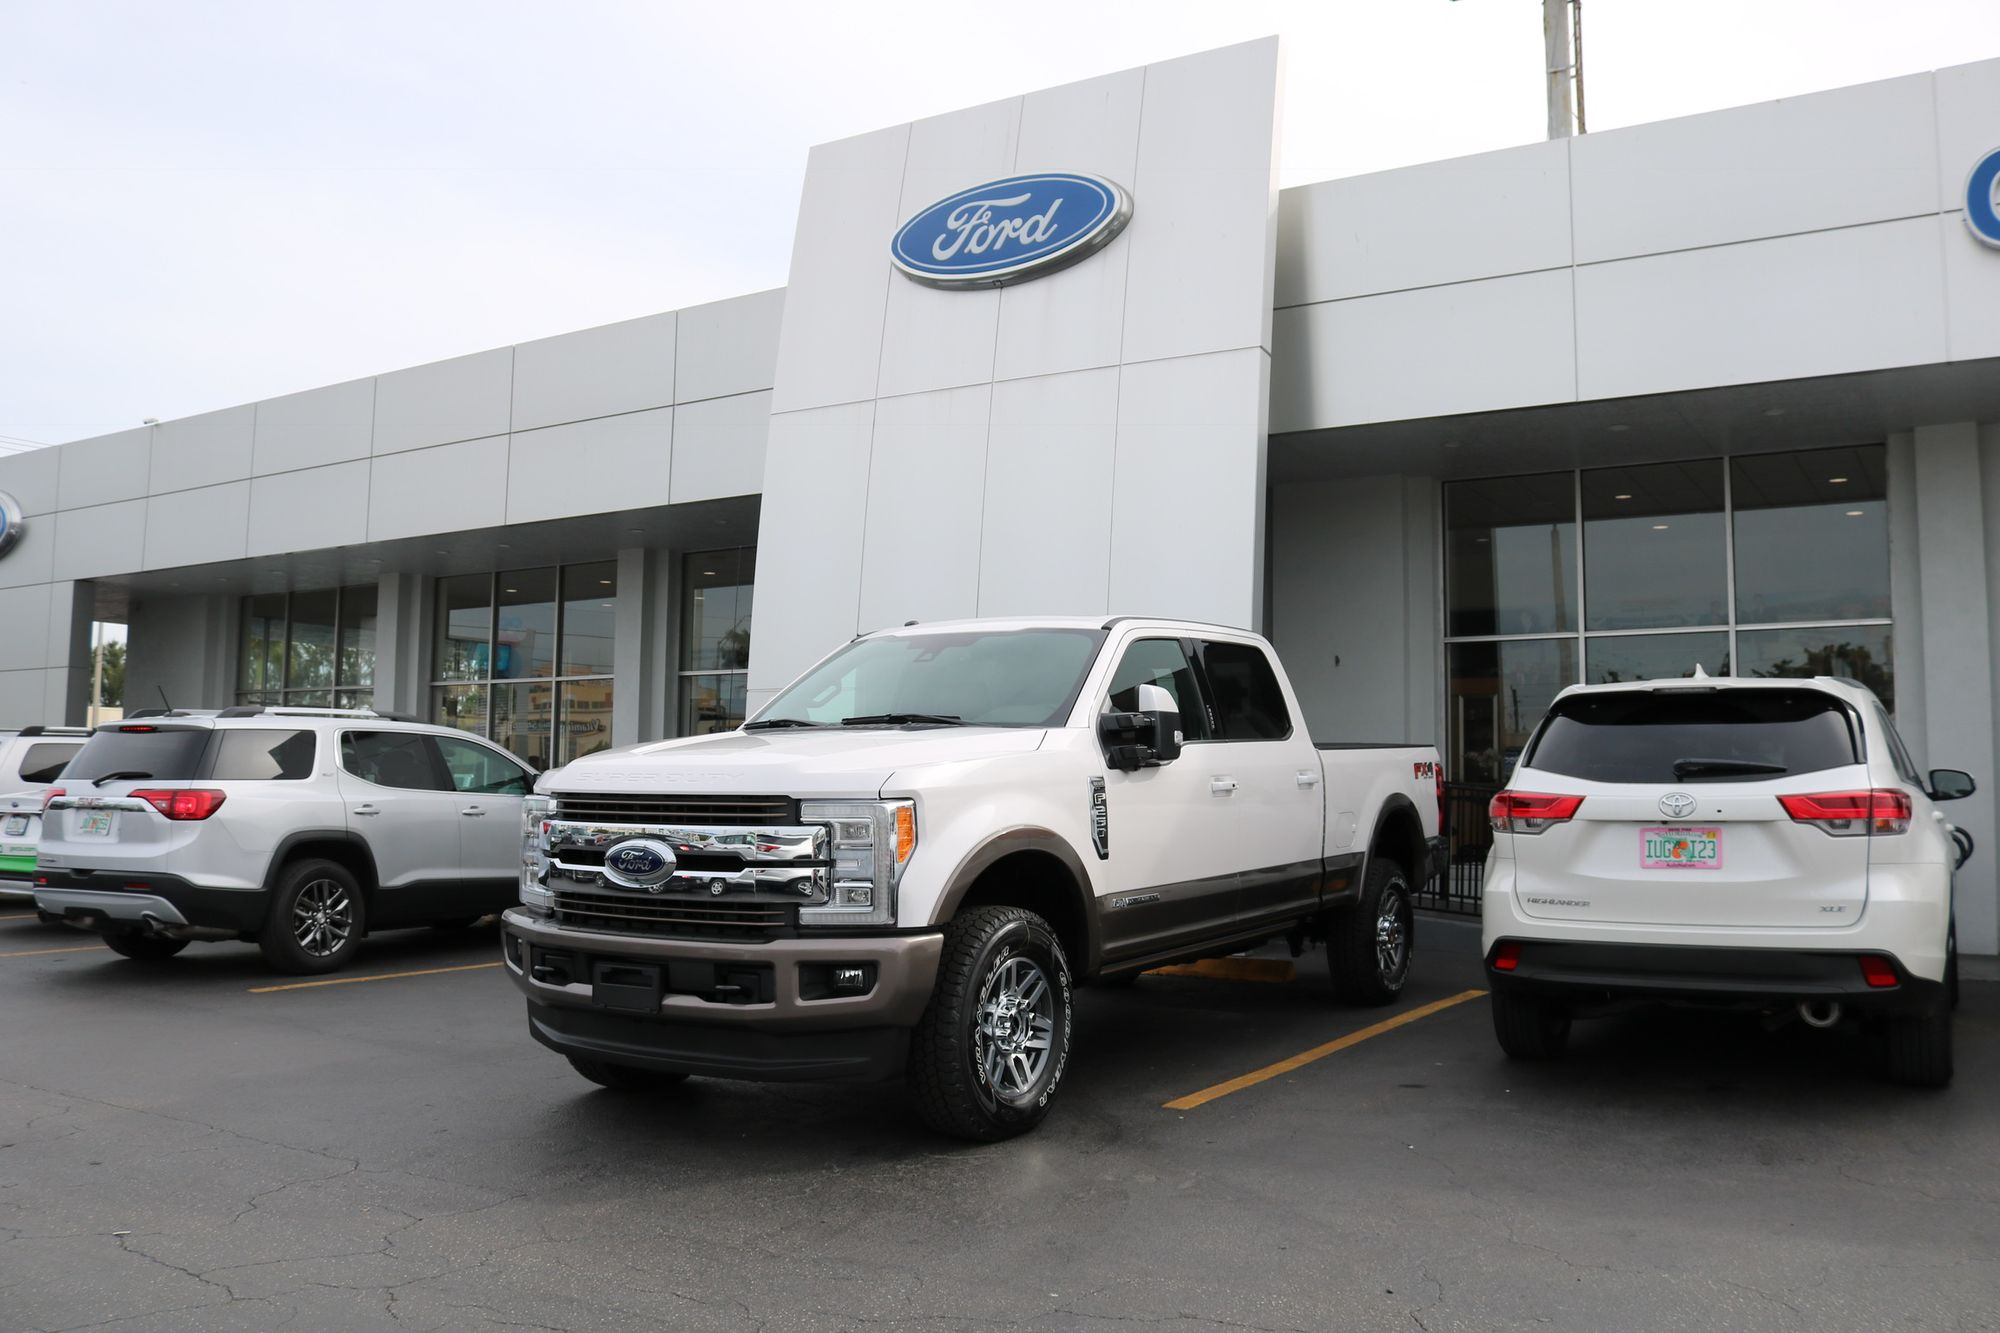 Ford truck dealership